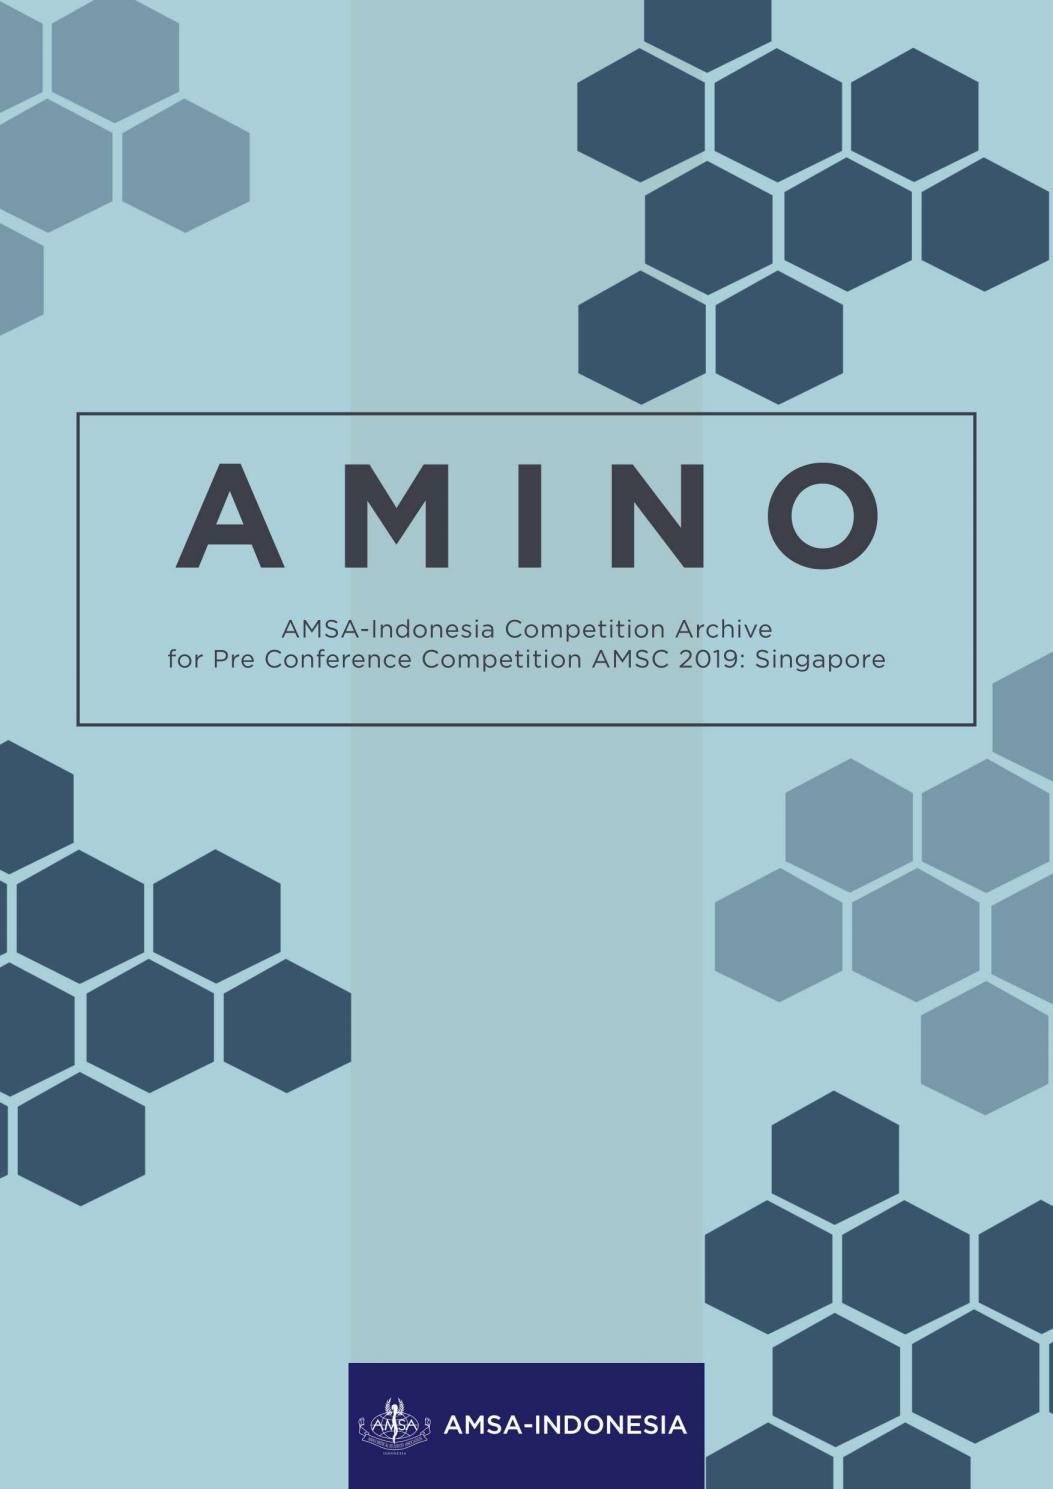 AMINO PCC AMSC 2019: Singapore by AMSA-Indonesia - issuu